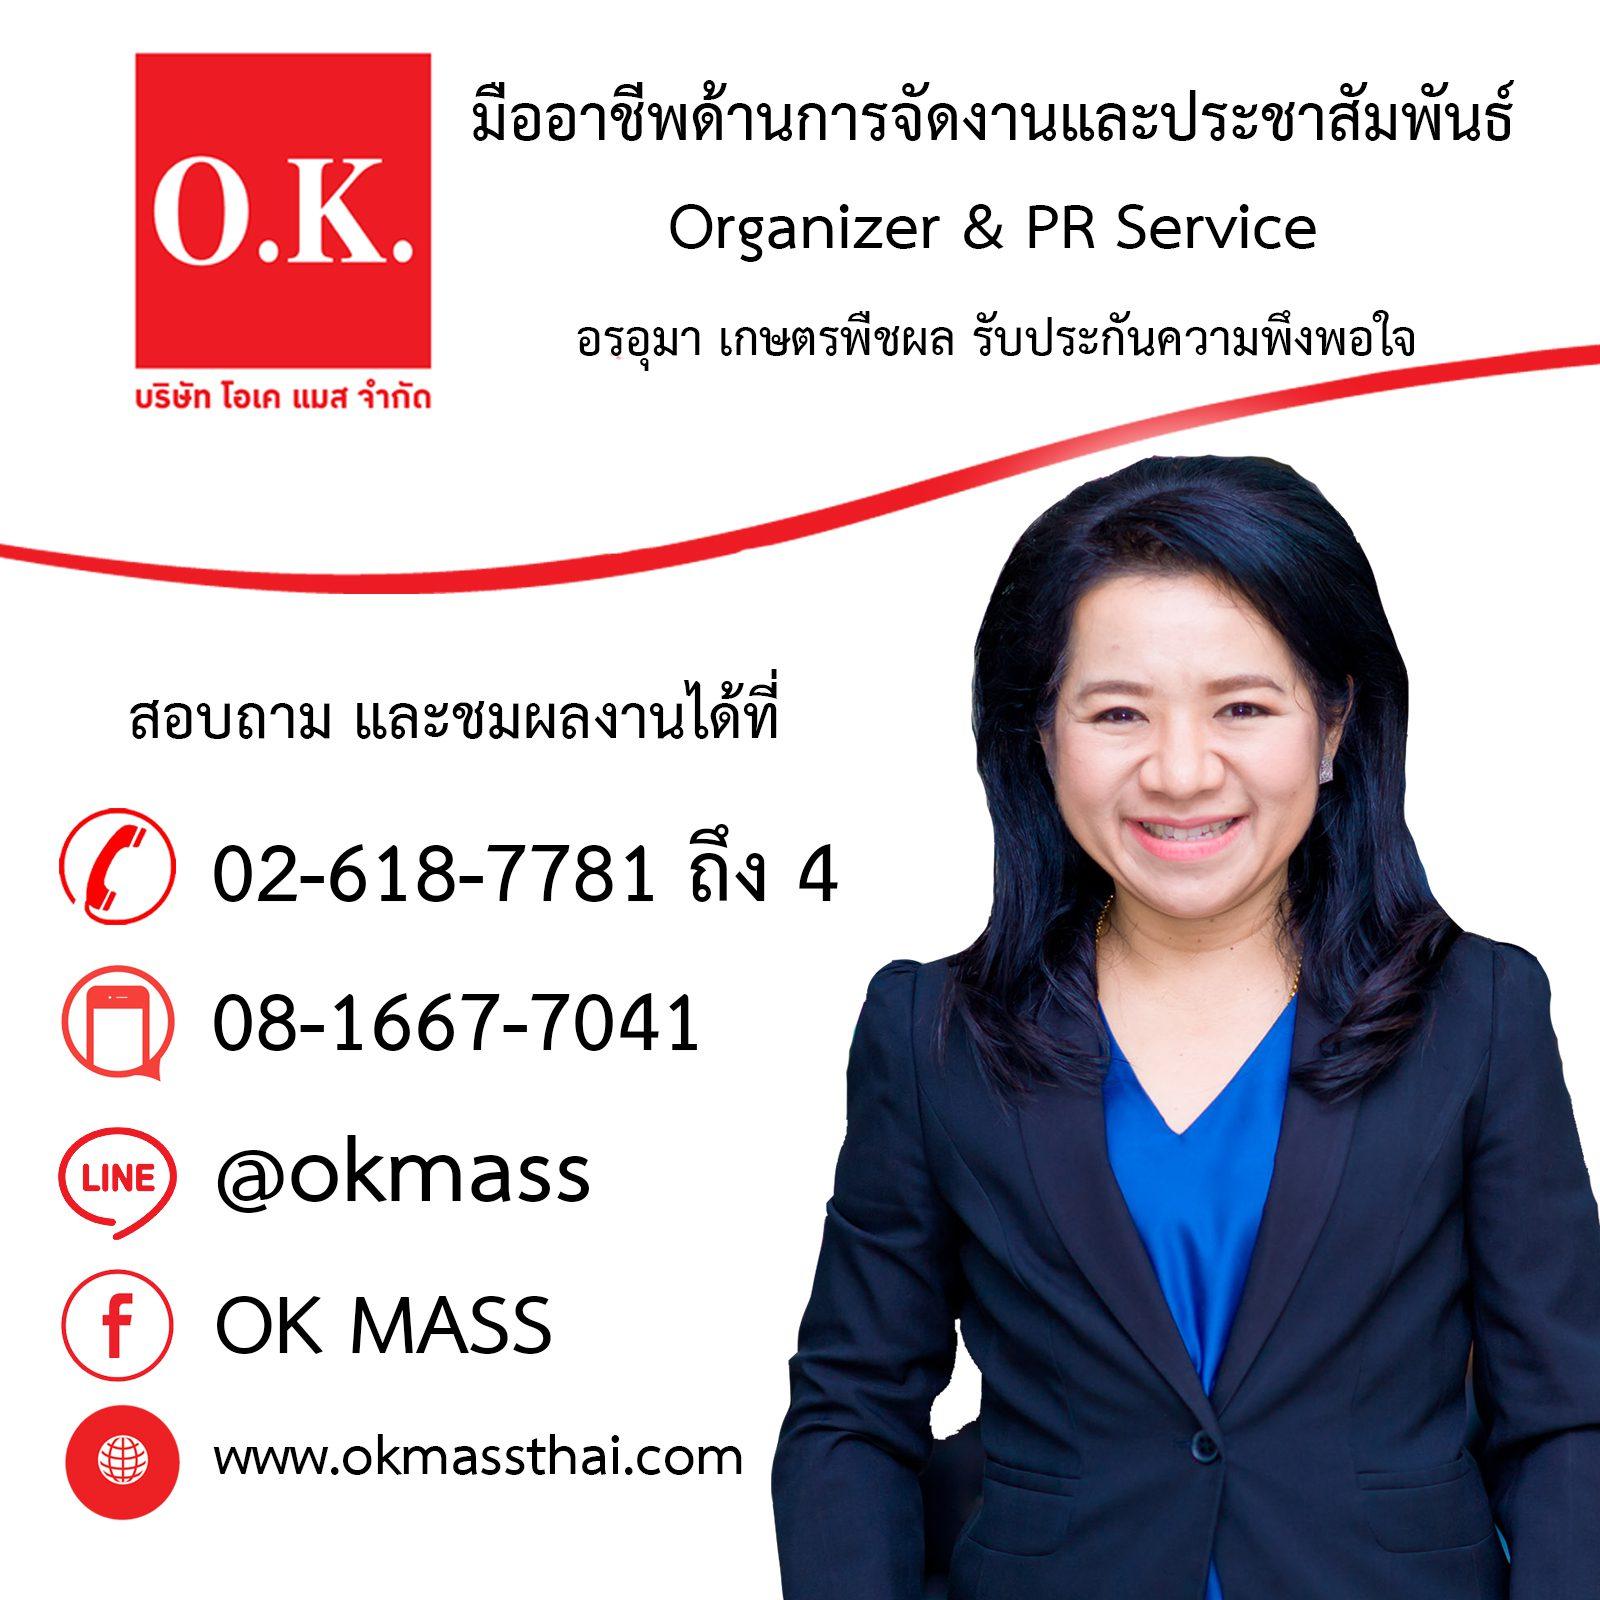 Ok mass  service  บริการให้คำปรึกษาและจัดกิจกรรมทางการตลาดอย่างมืออาชีพ